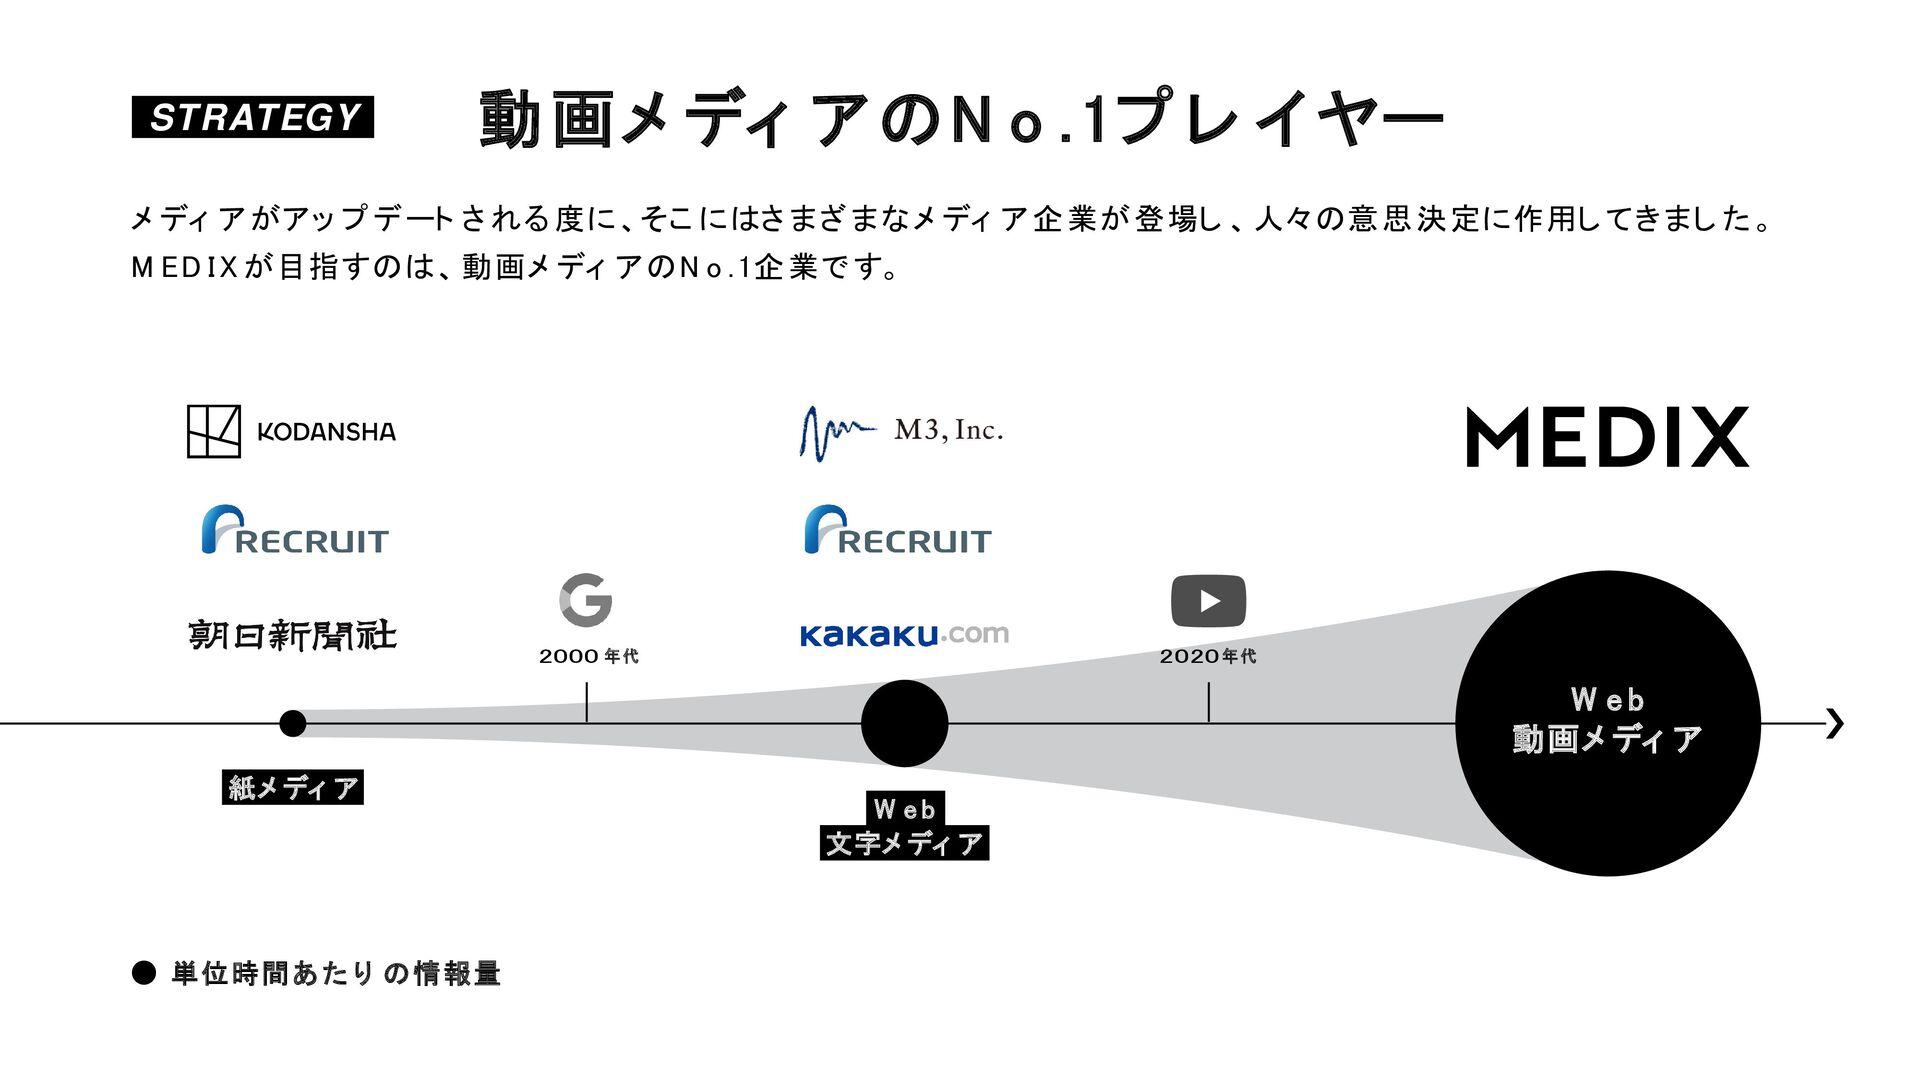 GROWTH ֓ཁ